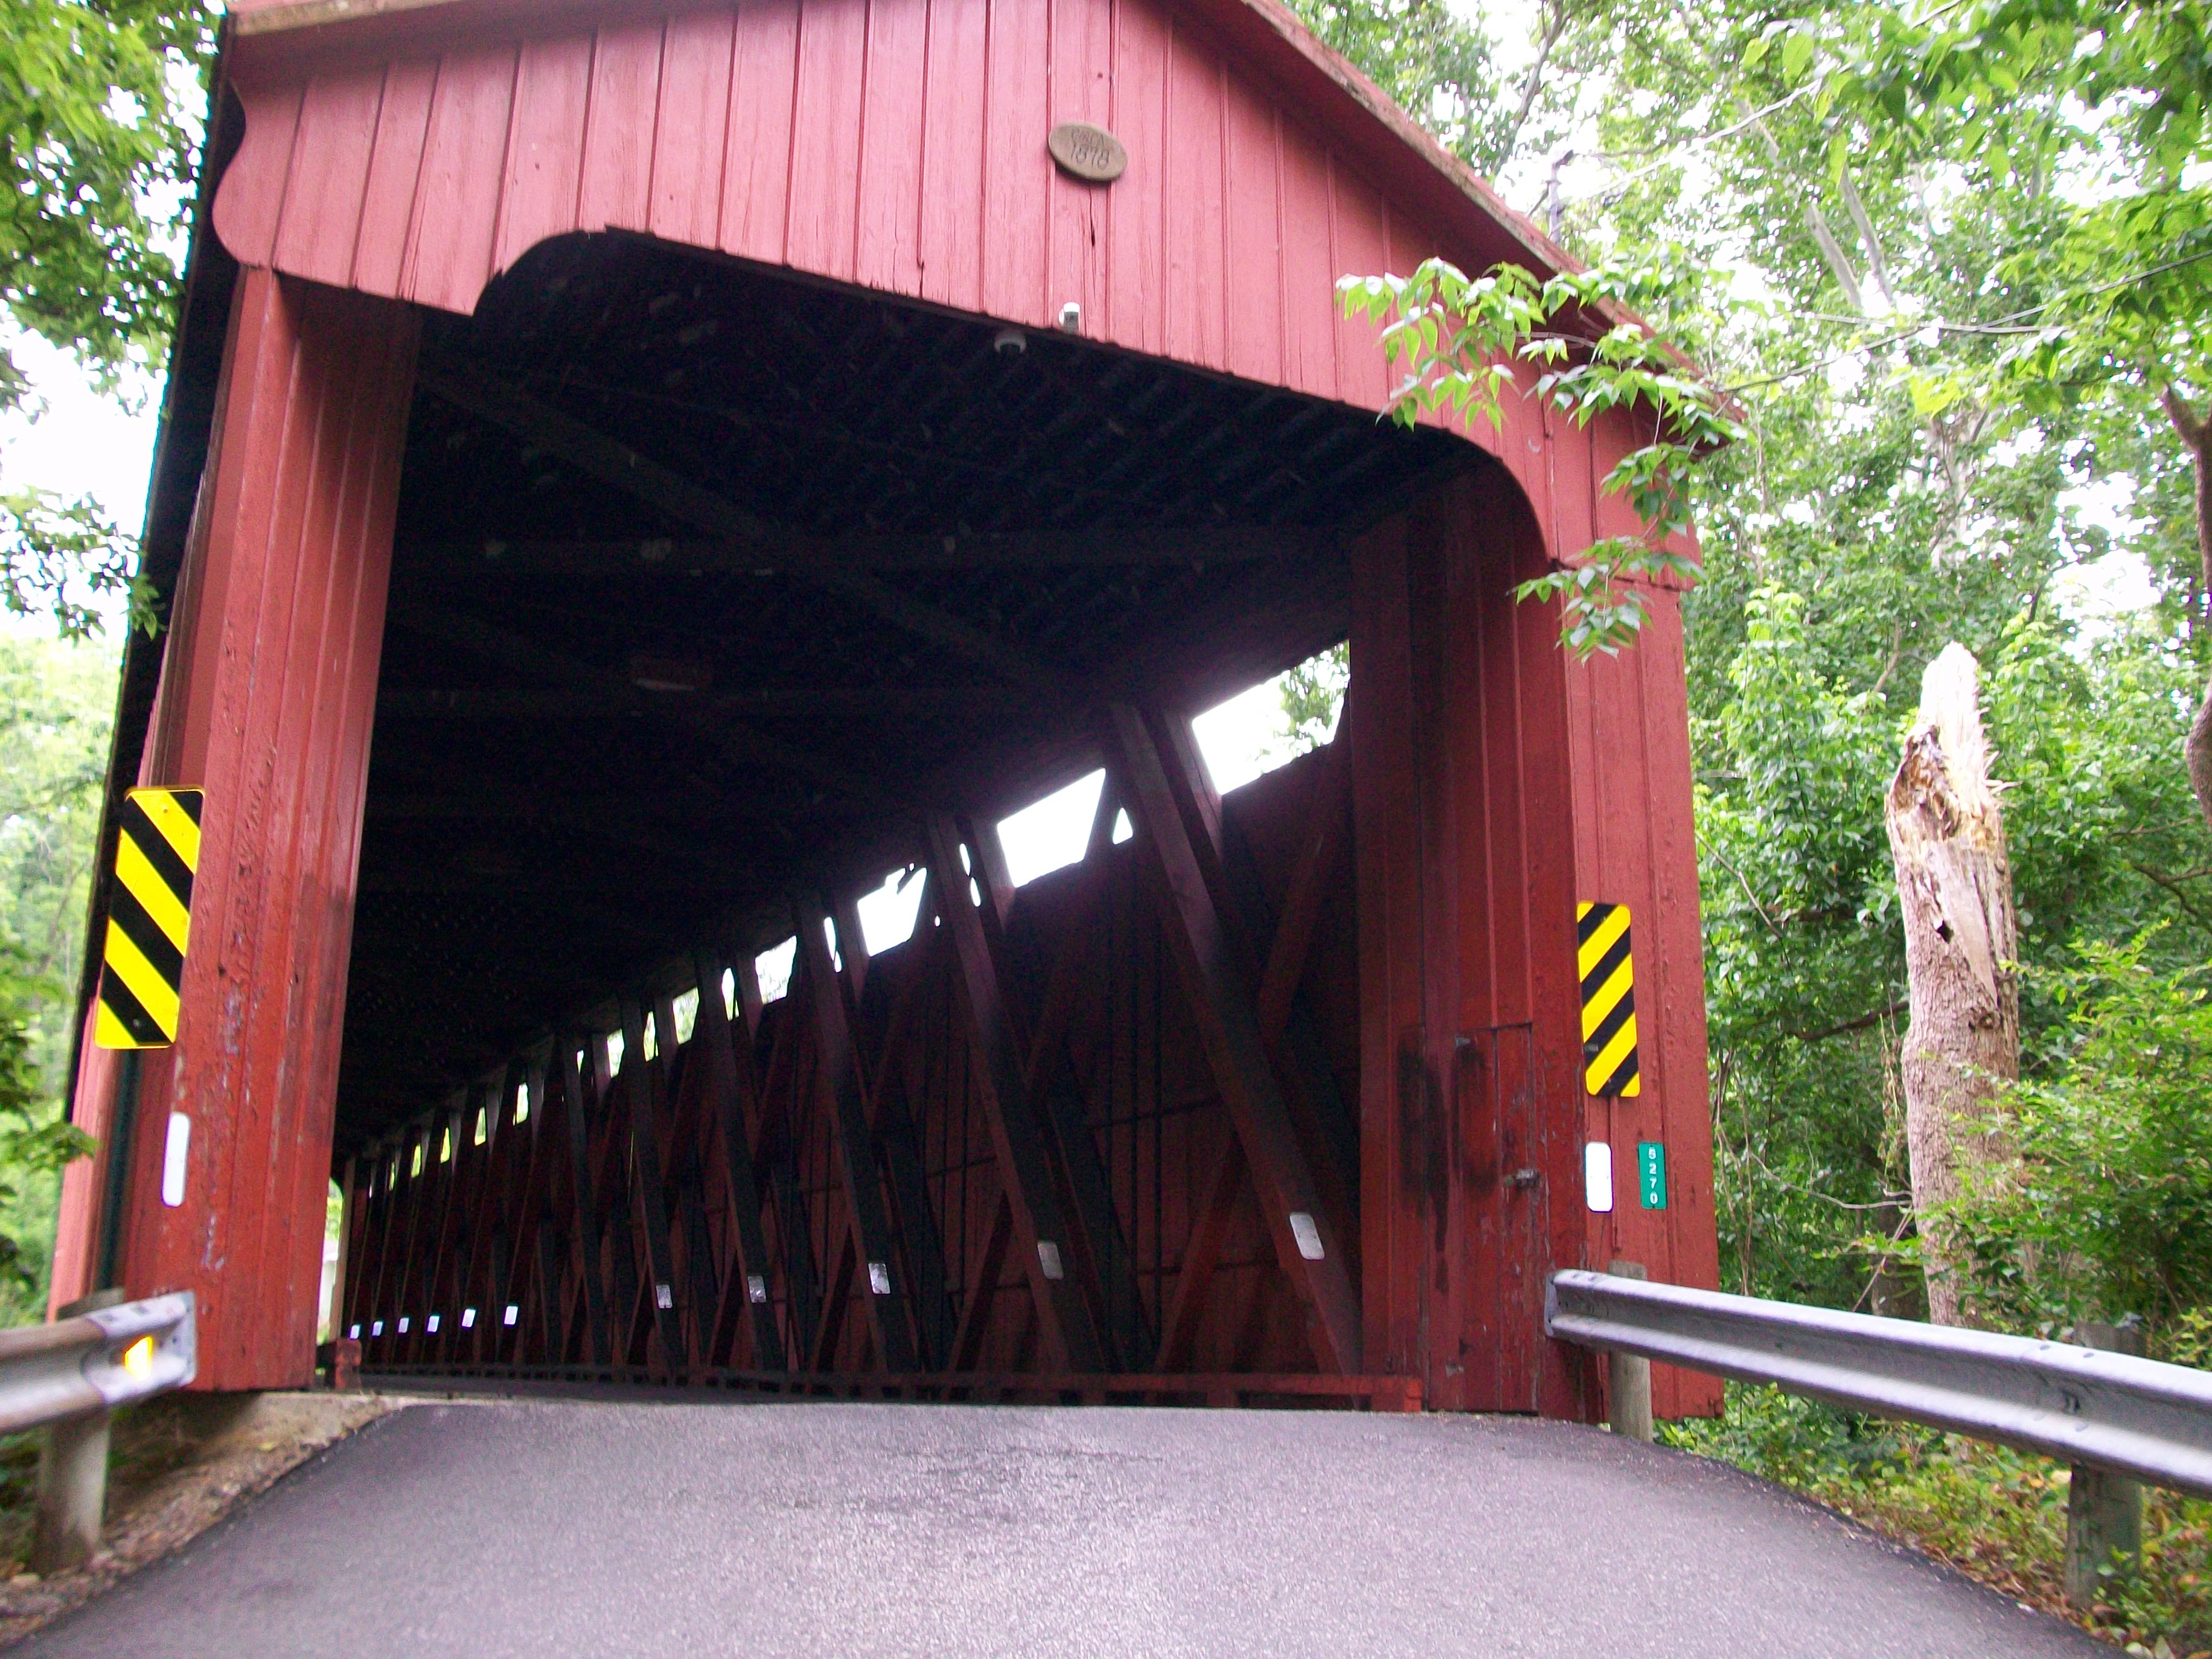 The Stonelick Covered Bridge | Creepy Cincinnati